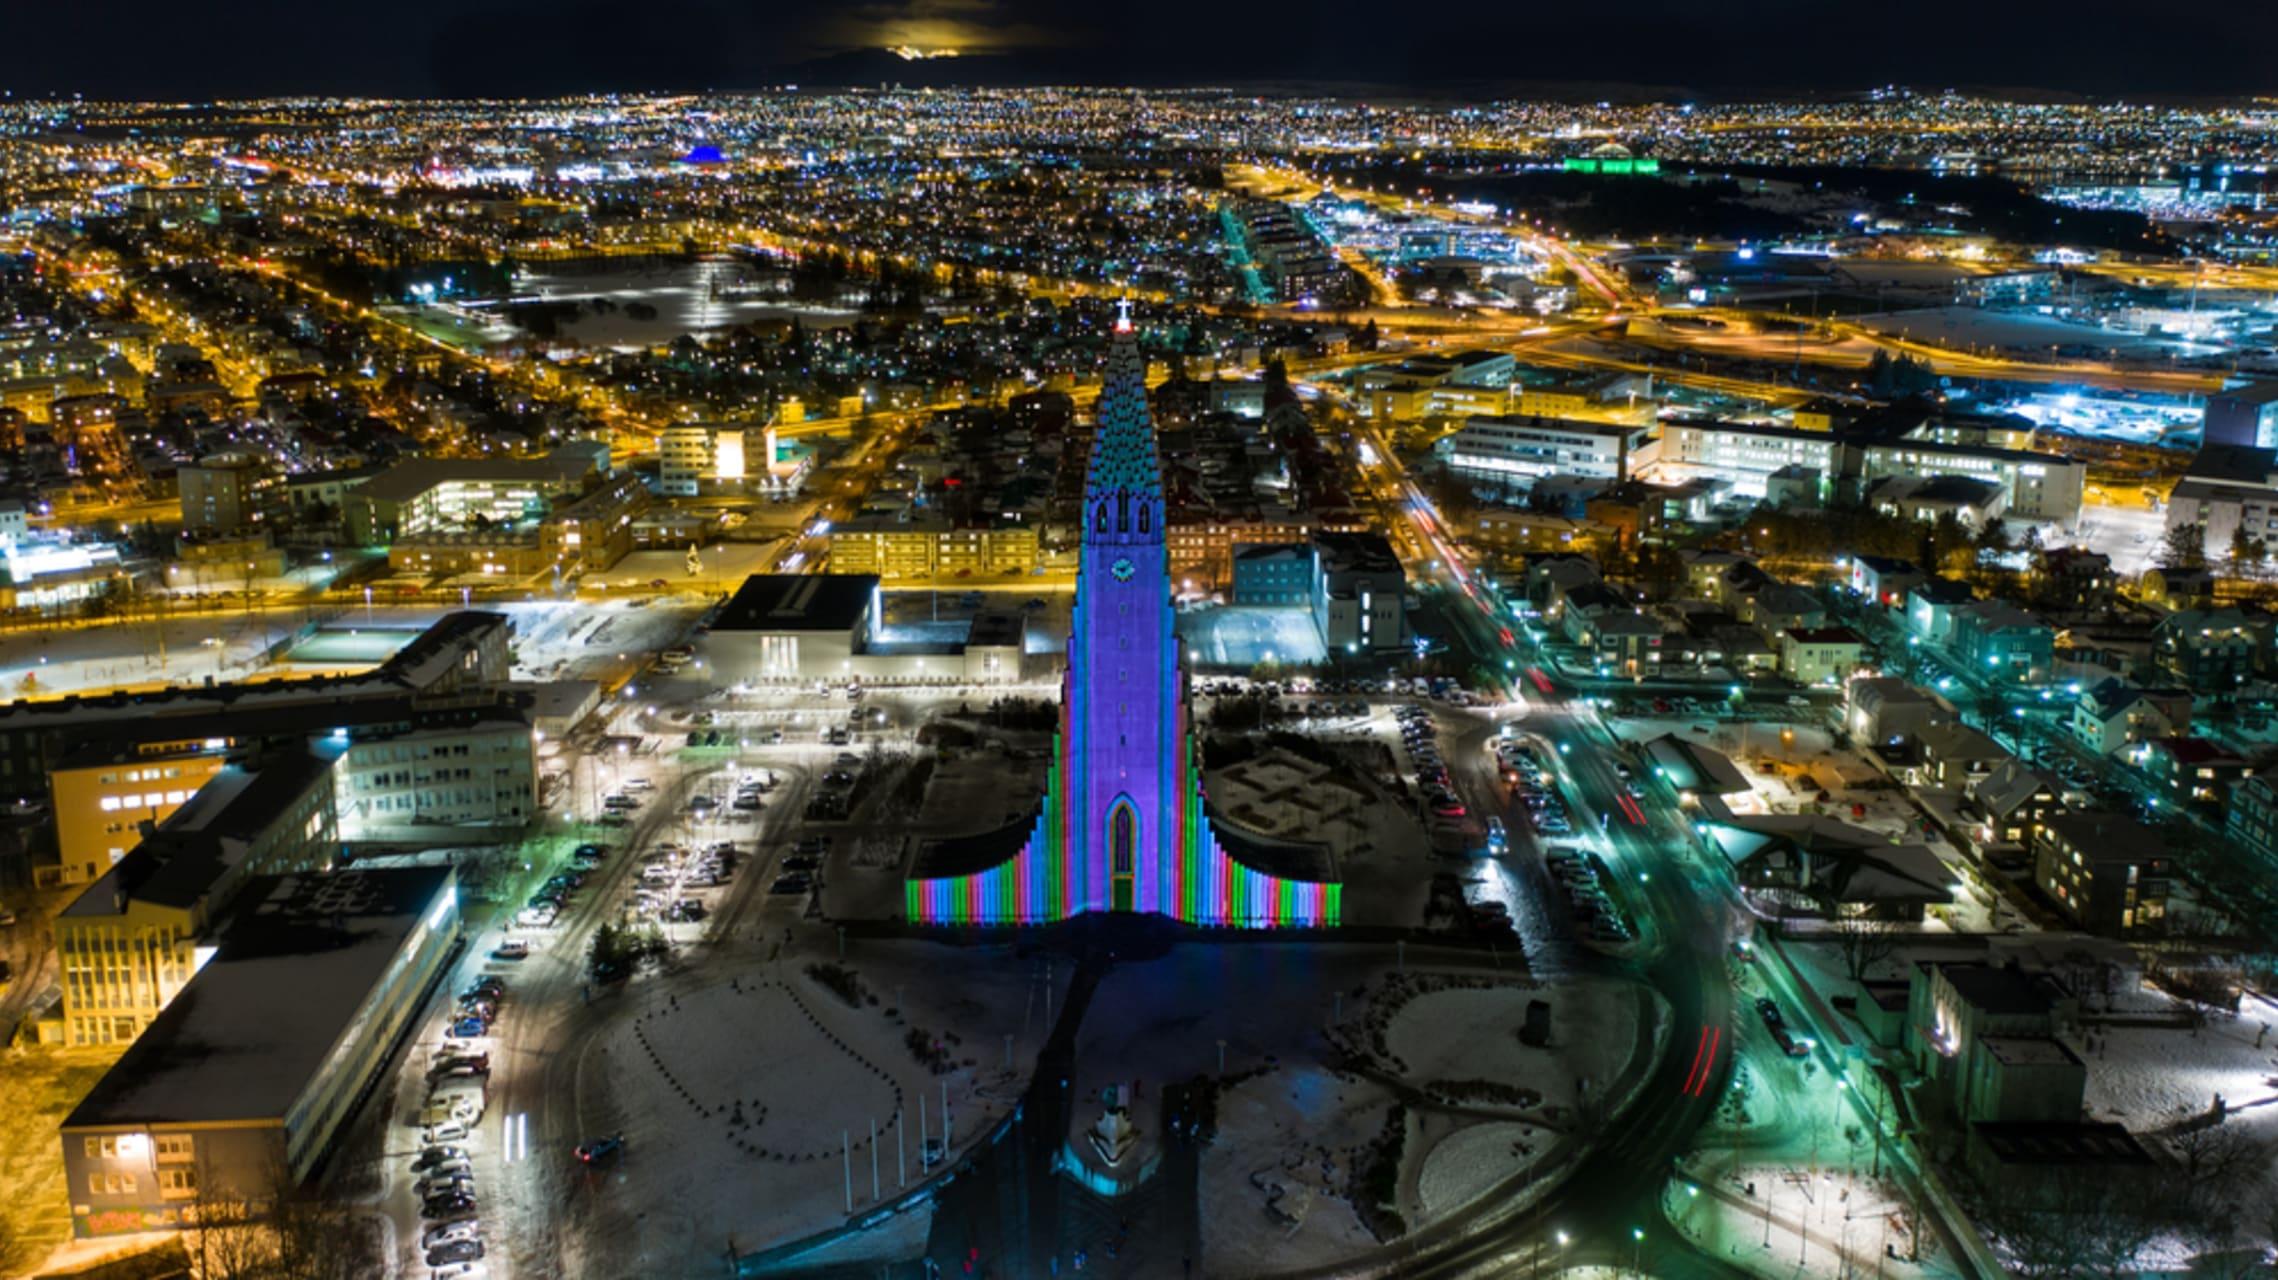 Reykjavik - Winter Festival in Reykjavik – a Virtual Walk Along the Trail of Light